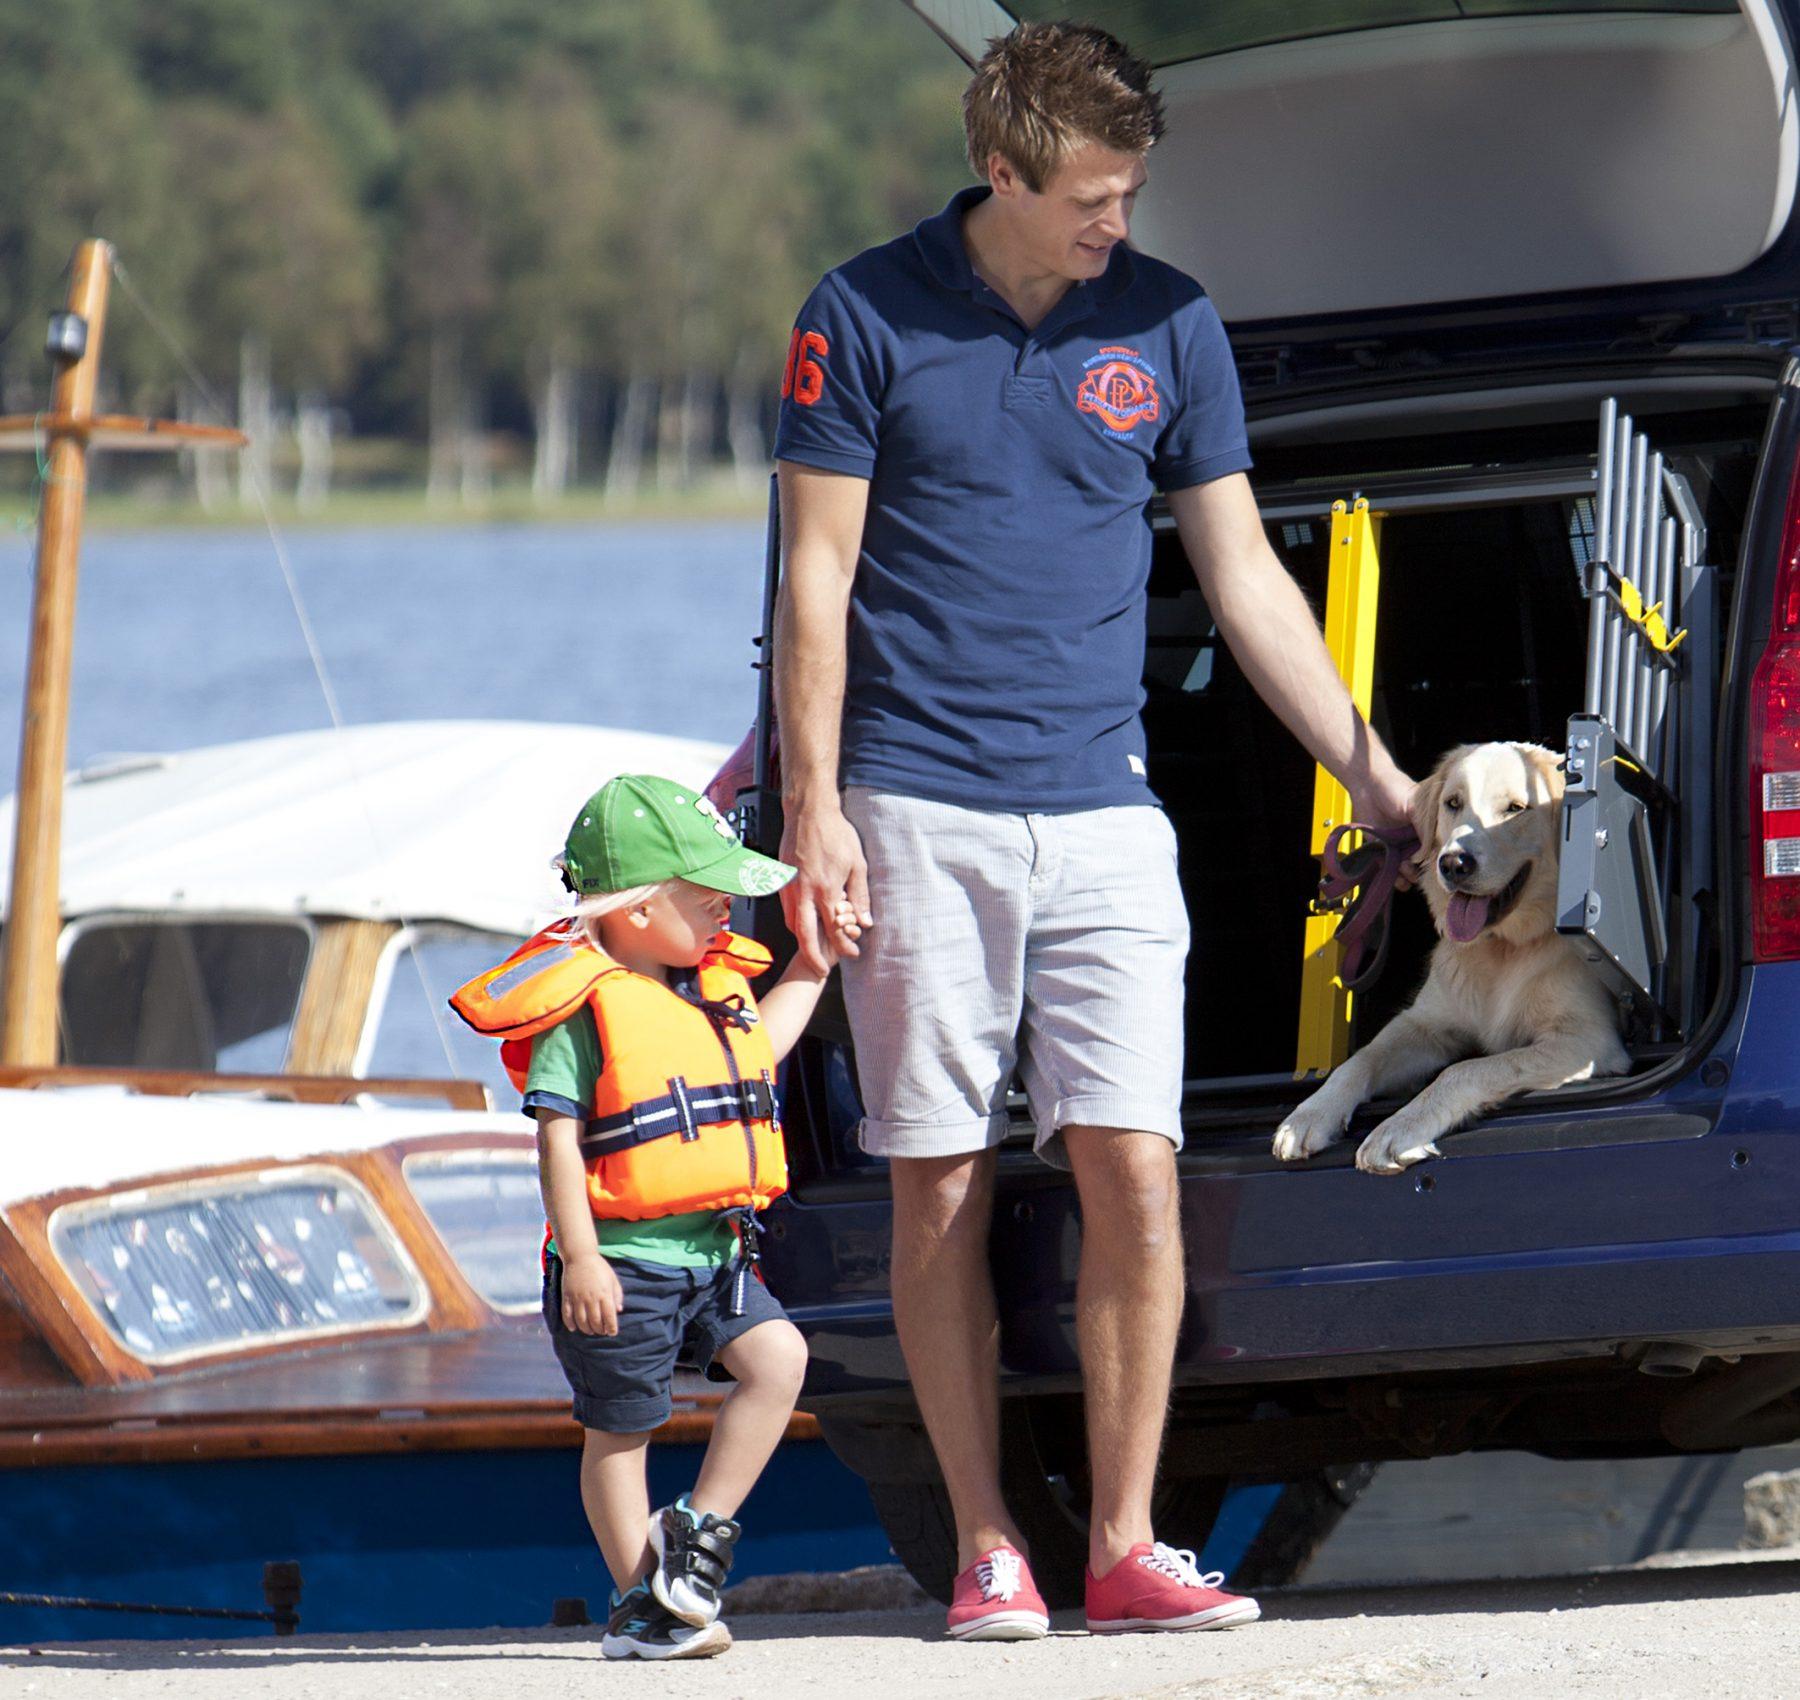 Family_Summer_boat_child_dog_-00364_180x170mm_print-1800x1700